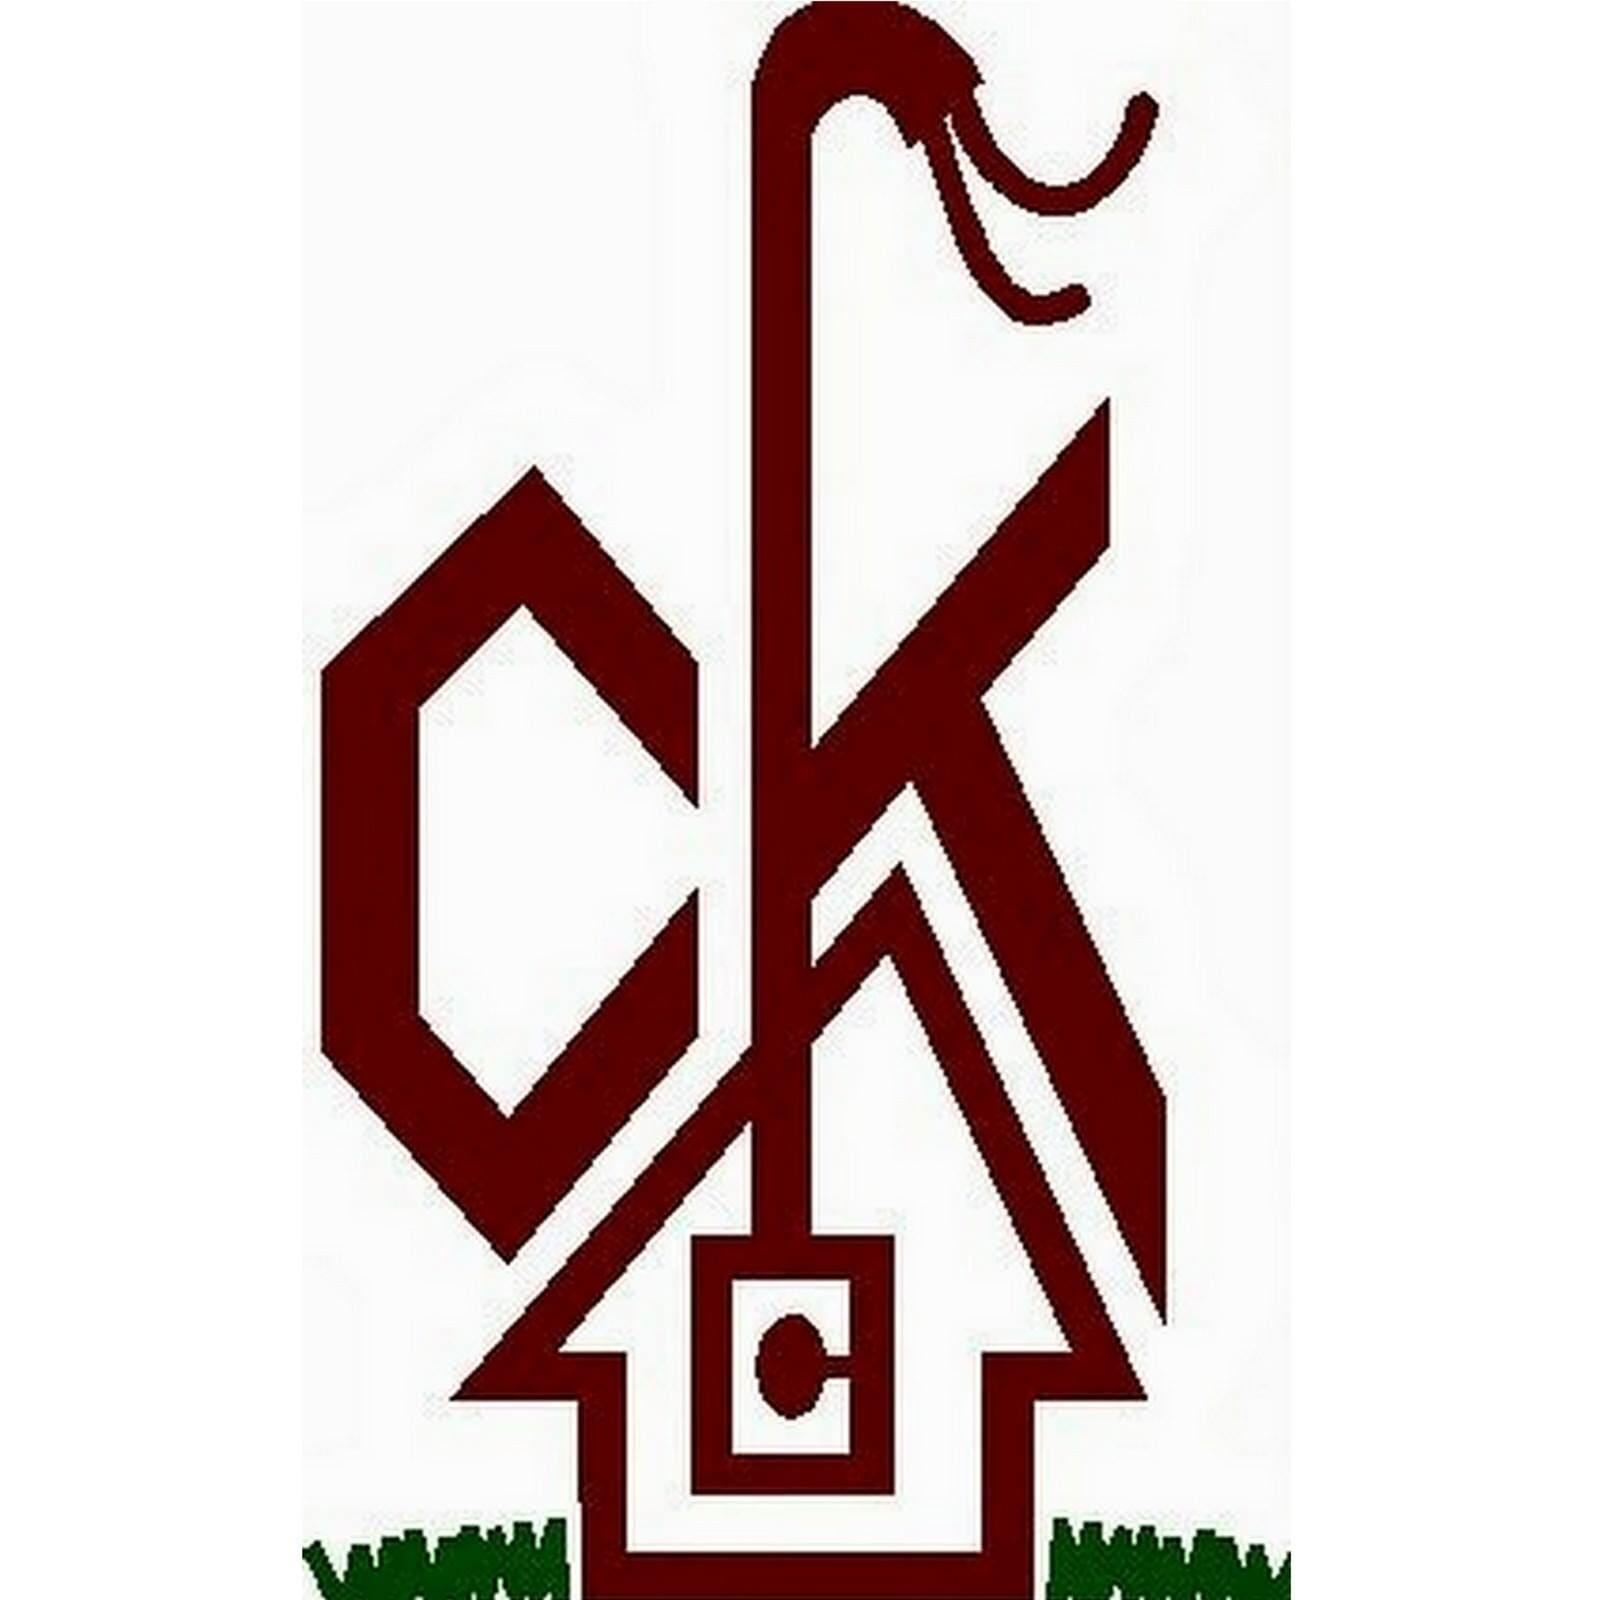 CK Electric LLC - New Berlin, WI 53151 - (414)840-6466 | ShowMeLocal.com